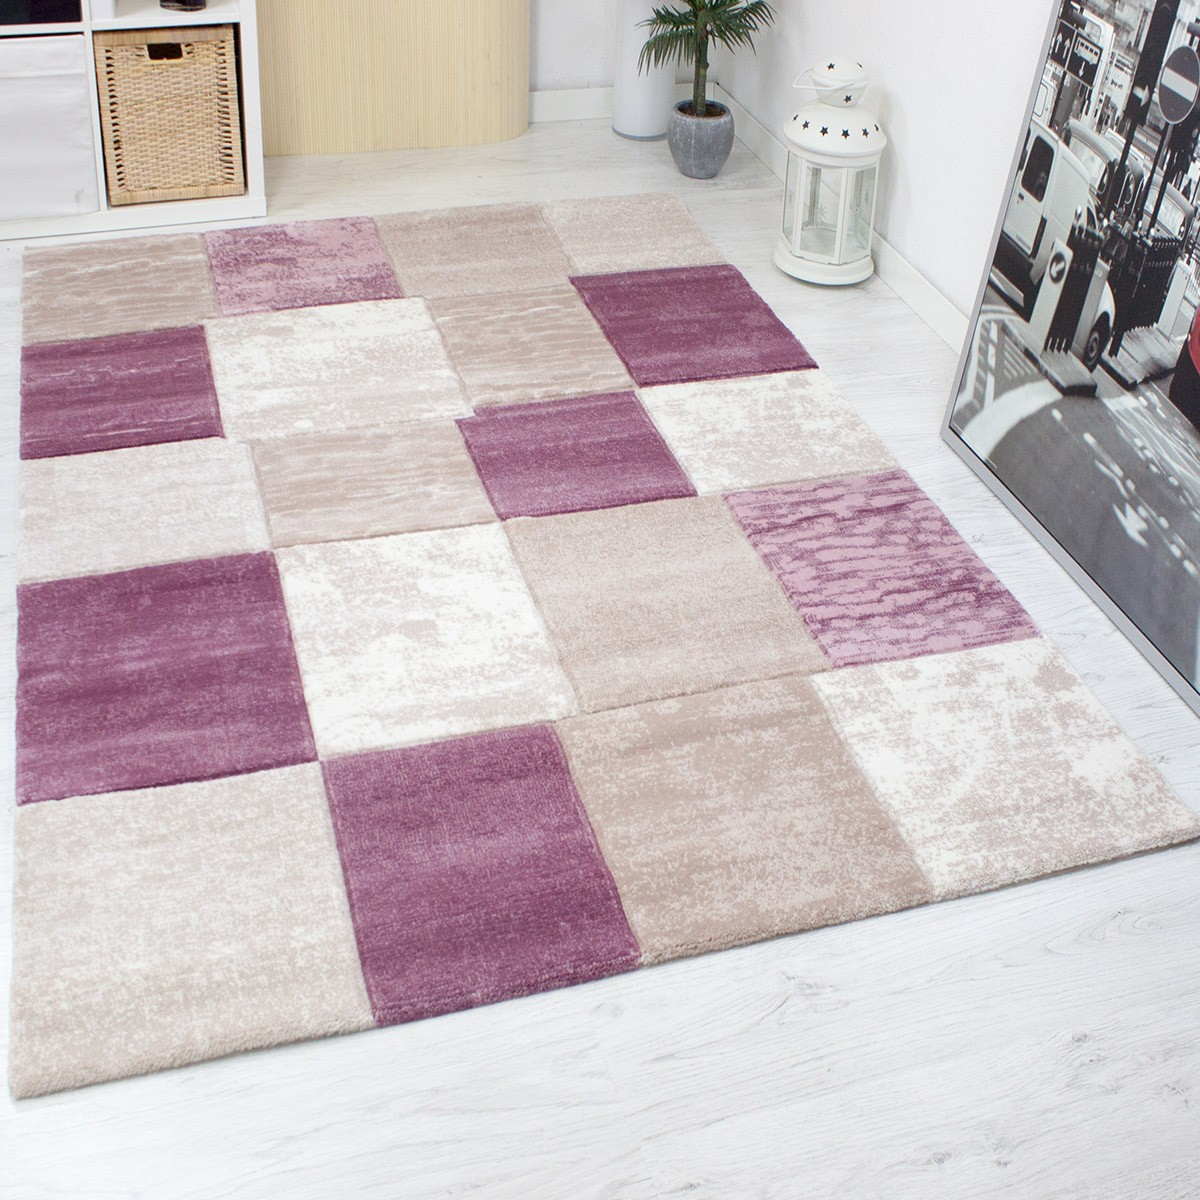 teppich modern designer kariert meliert in rosa pink sehr. Black Bedroom Furniture Sets. Home Design Ideas